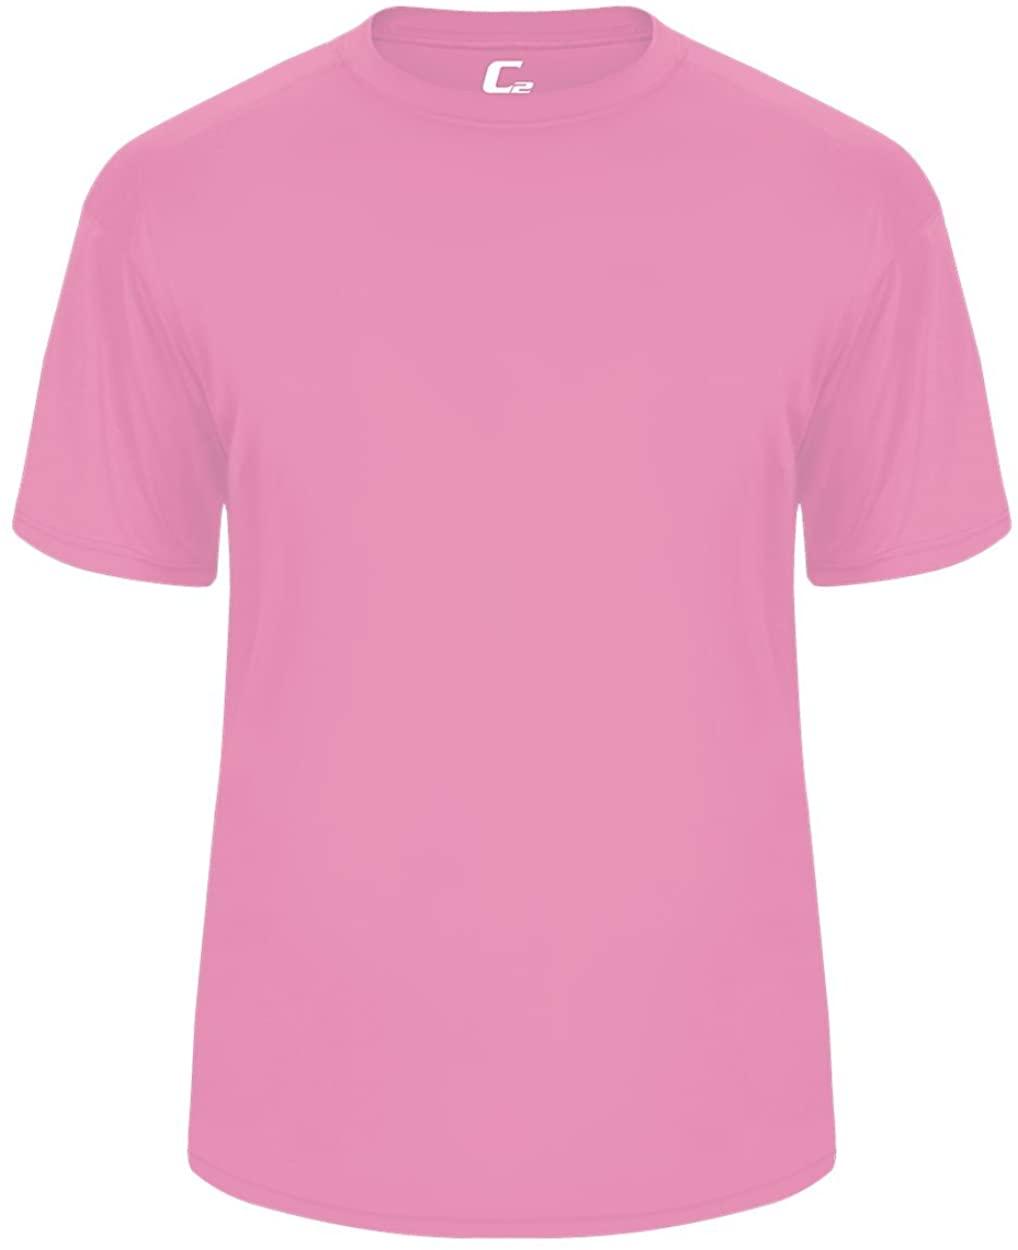 Pink Youth Large Short Sleeve Performance Wicking Athletic Sports Shirt/Undershirt/Jersey